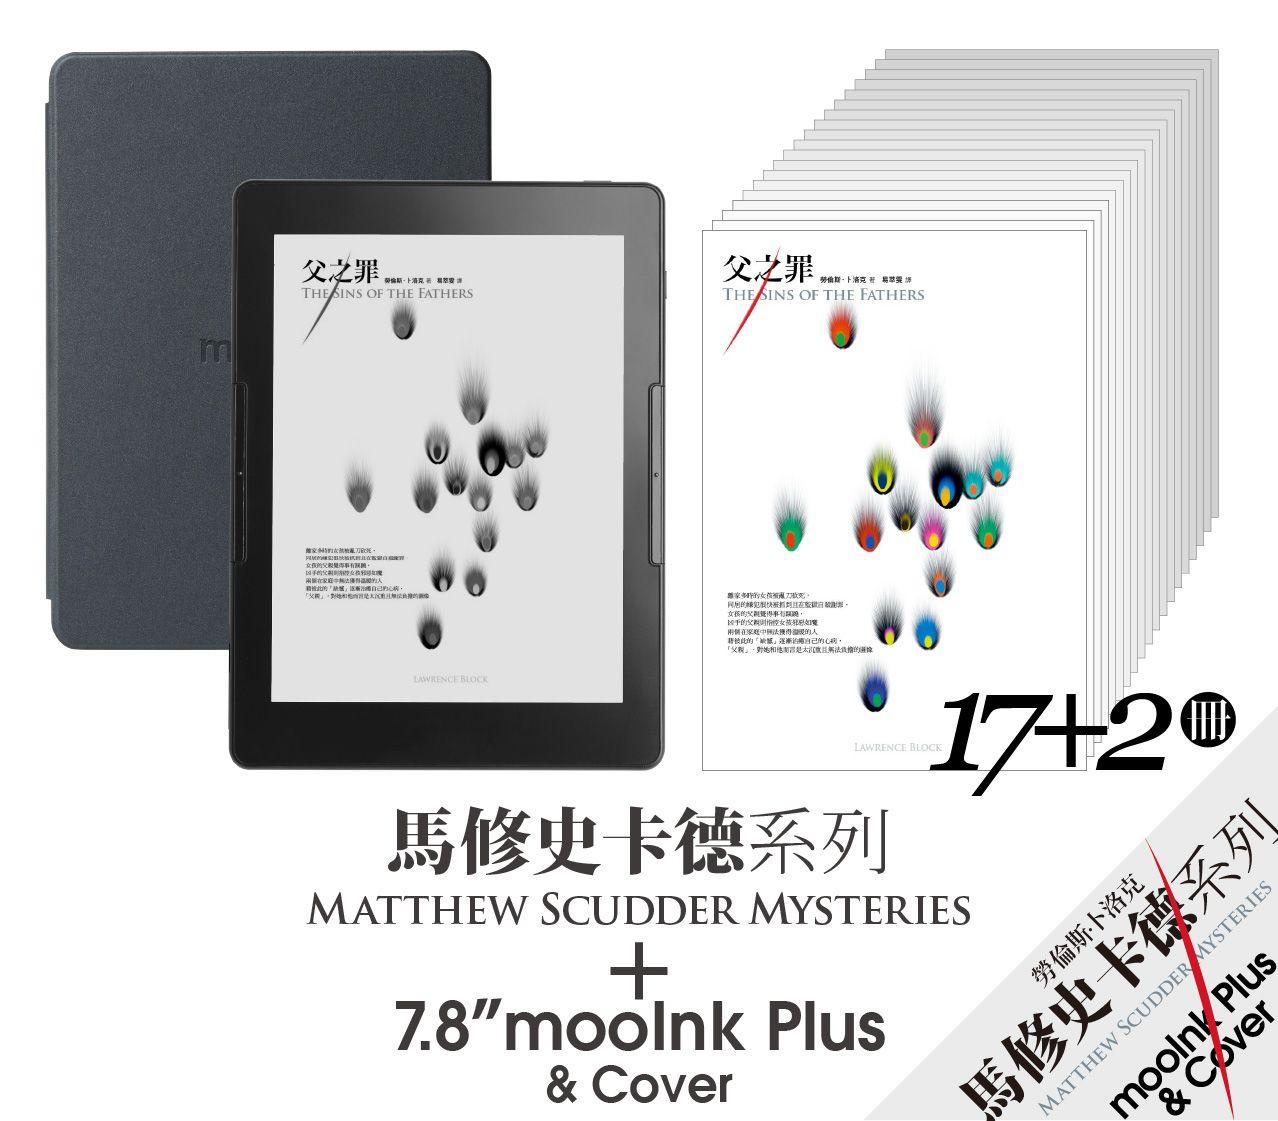 mooInk Plus + 保護殼 +《馬修.史卡德系列珍藏紀念版套書(17+2冊)》套組